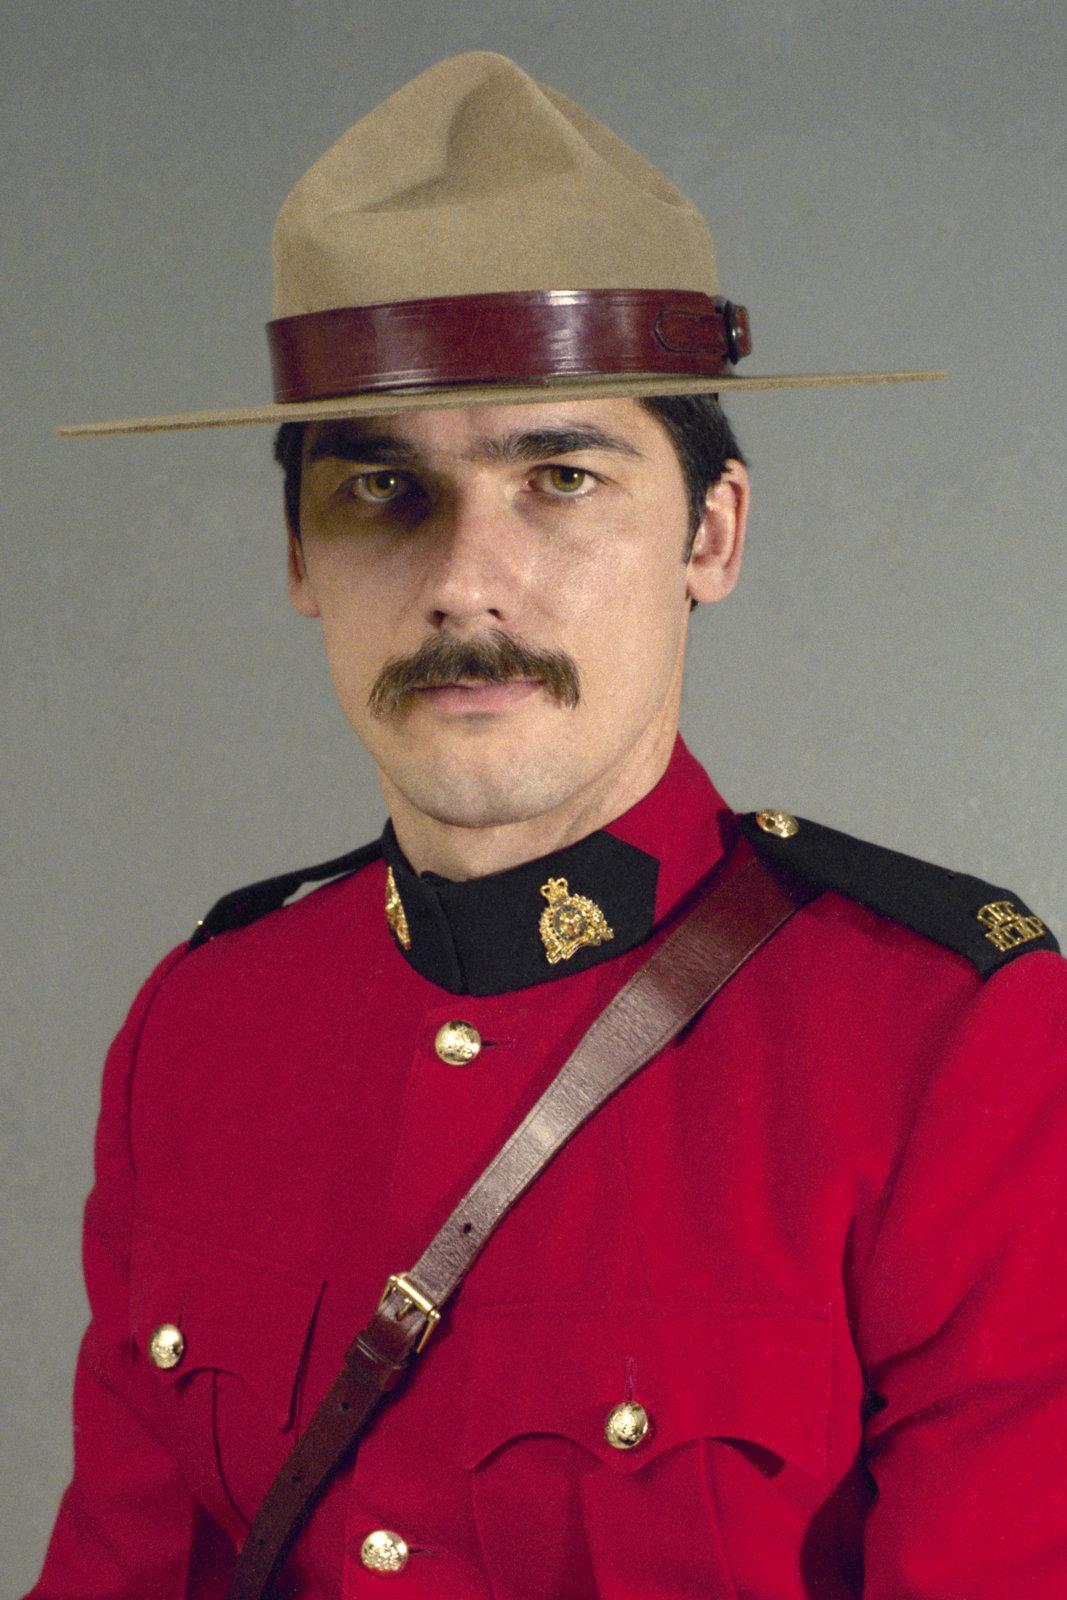 Corporal Derek John Flanagan